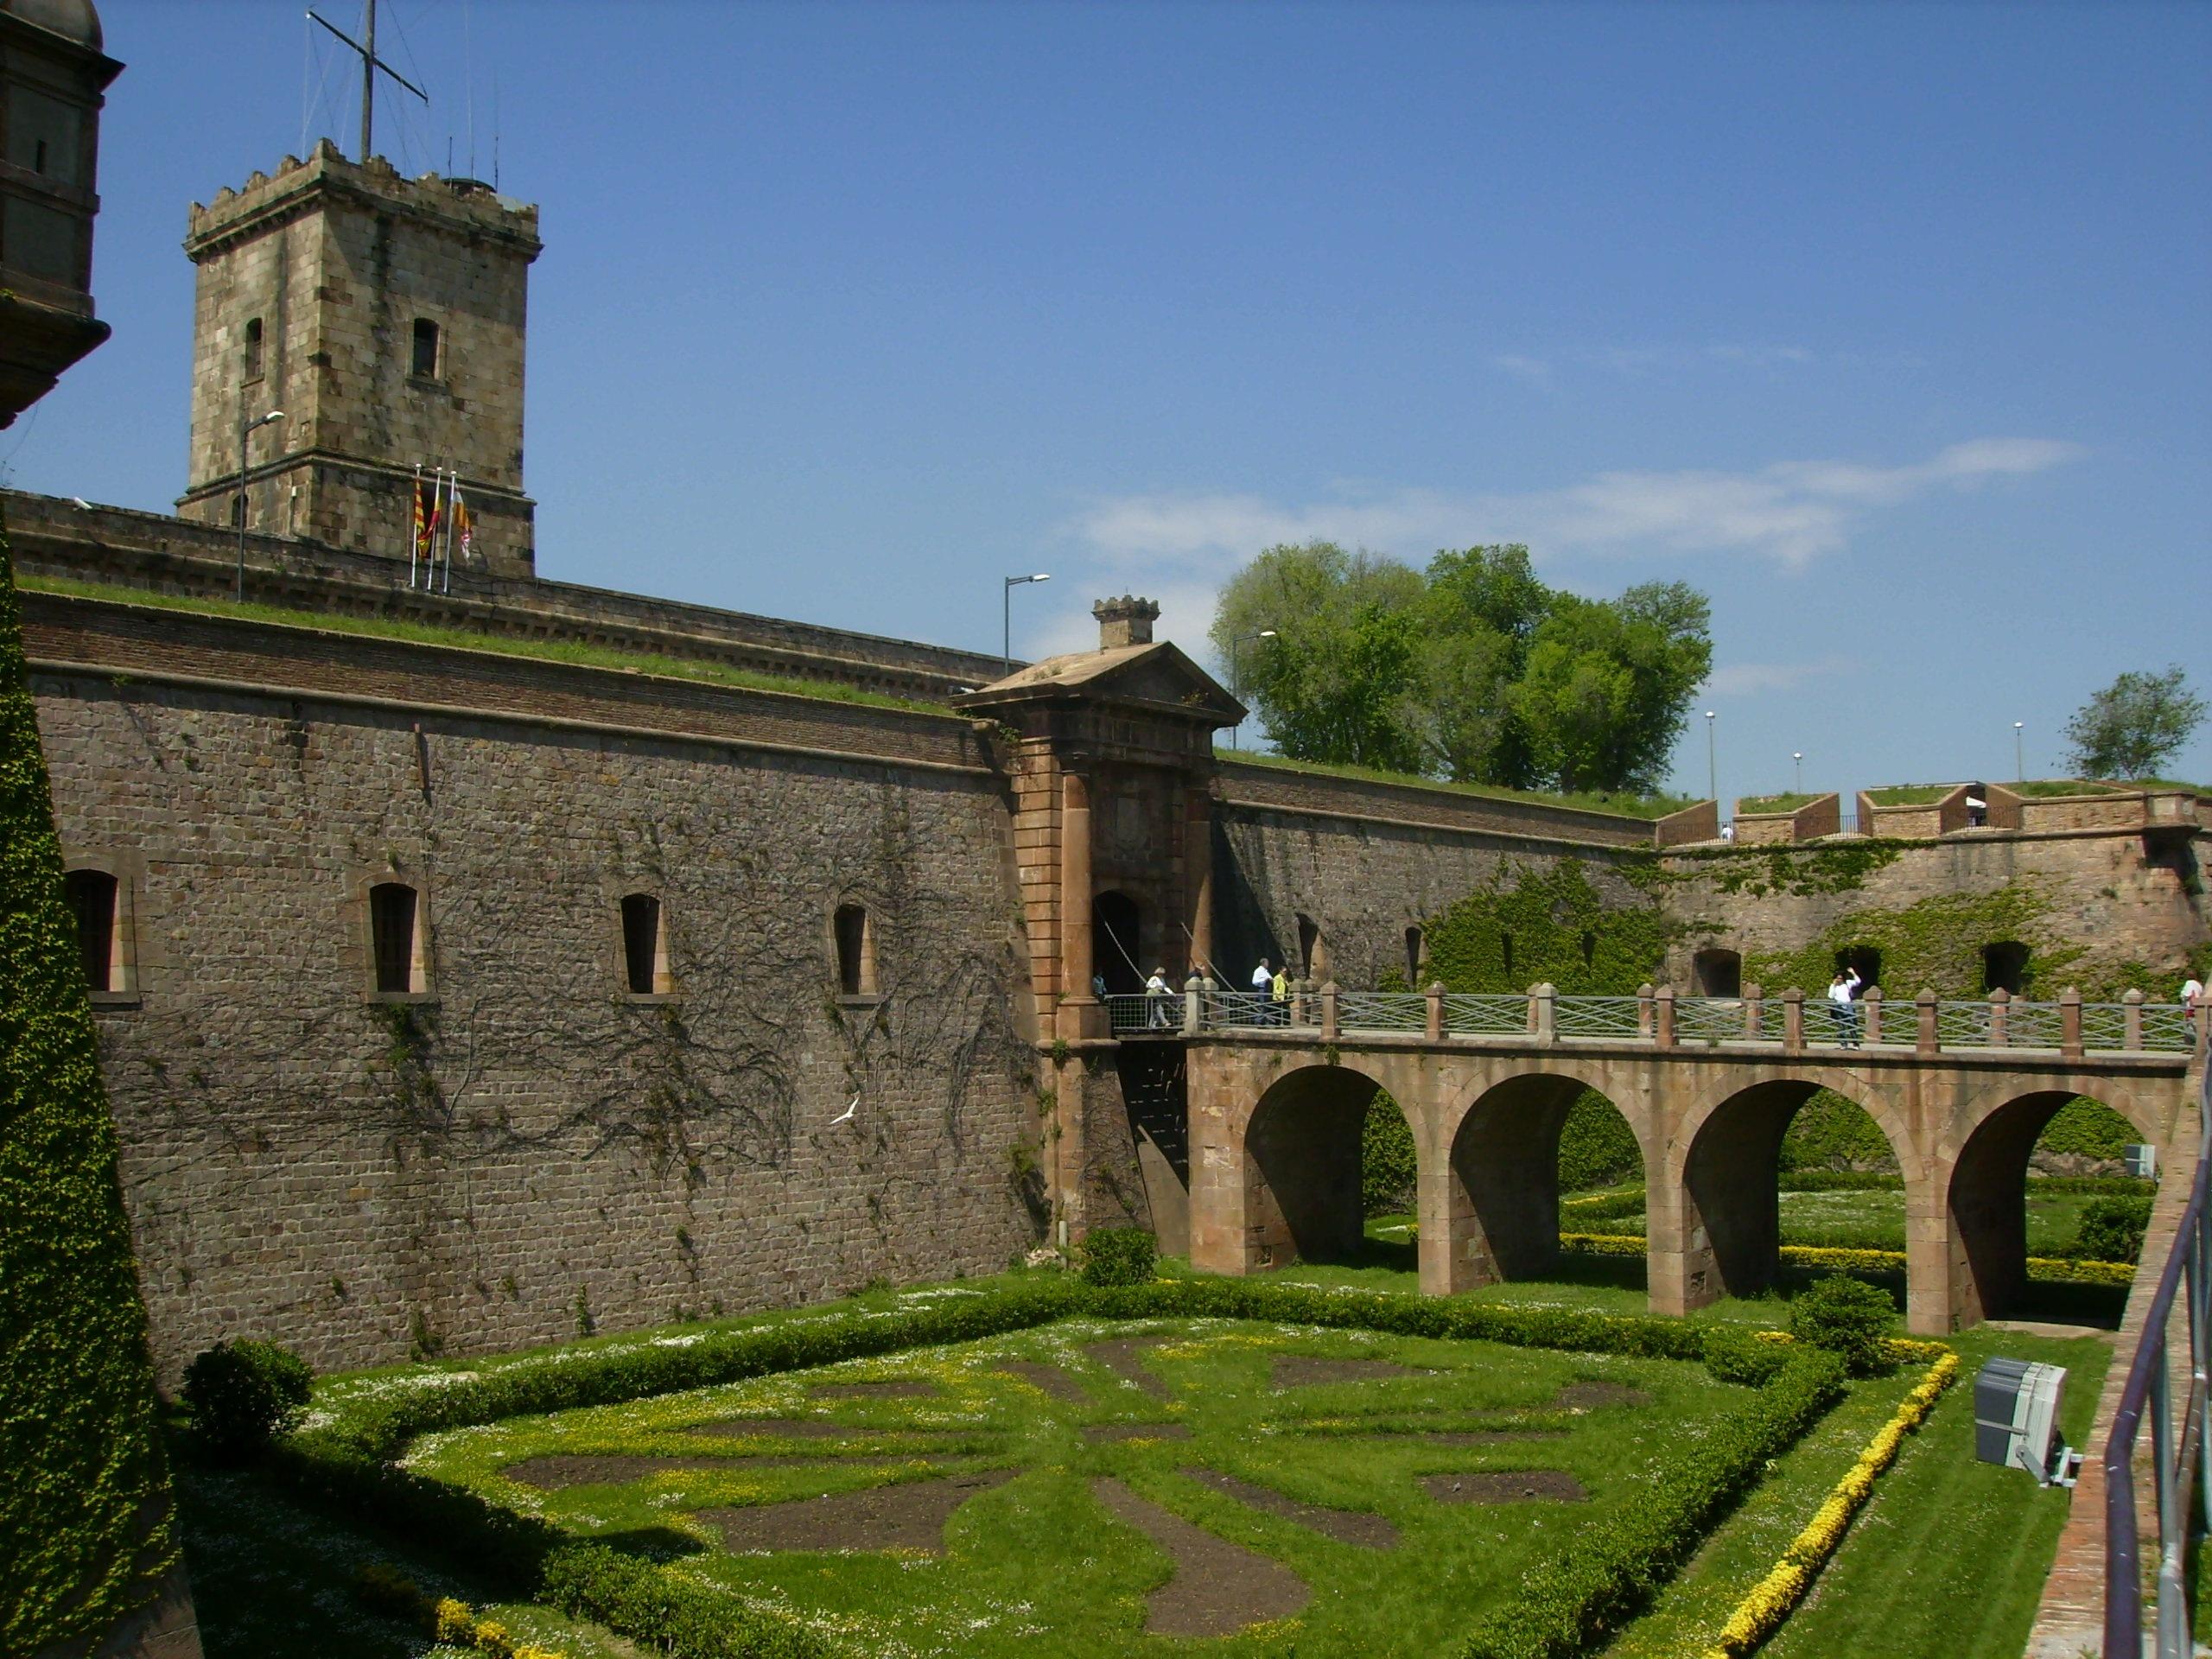 Castell_de_Montjuic_-_Fossat_entrada_-_Barcelona_(Catalonia)